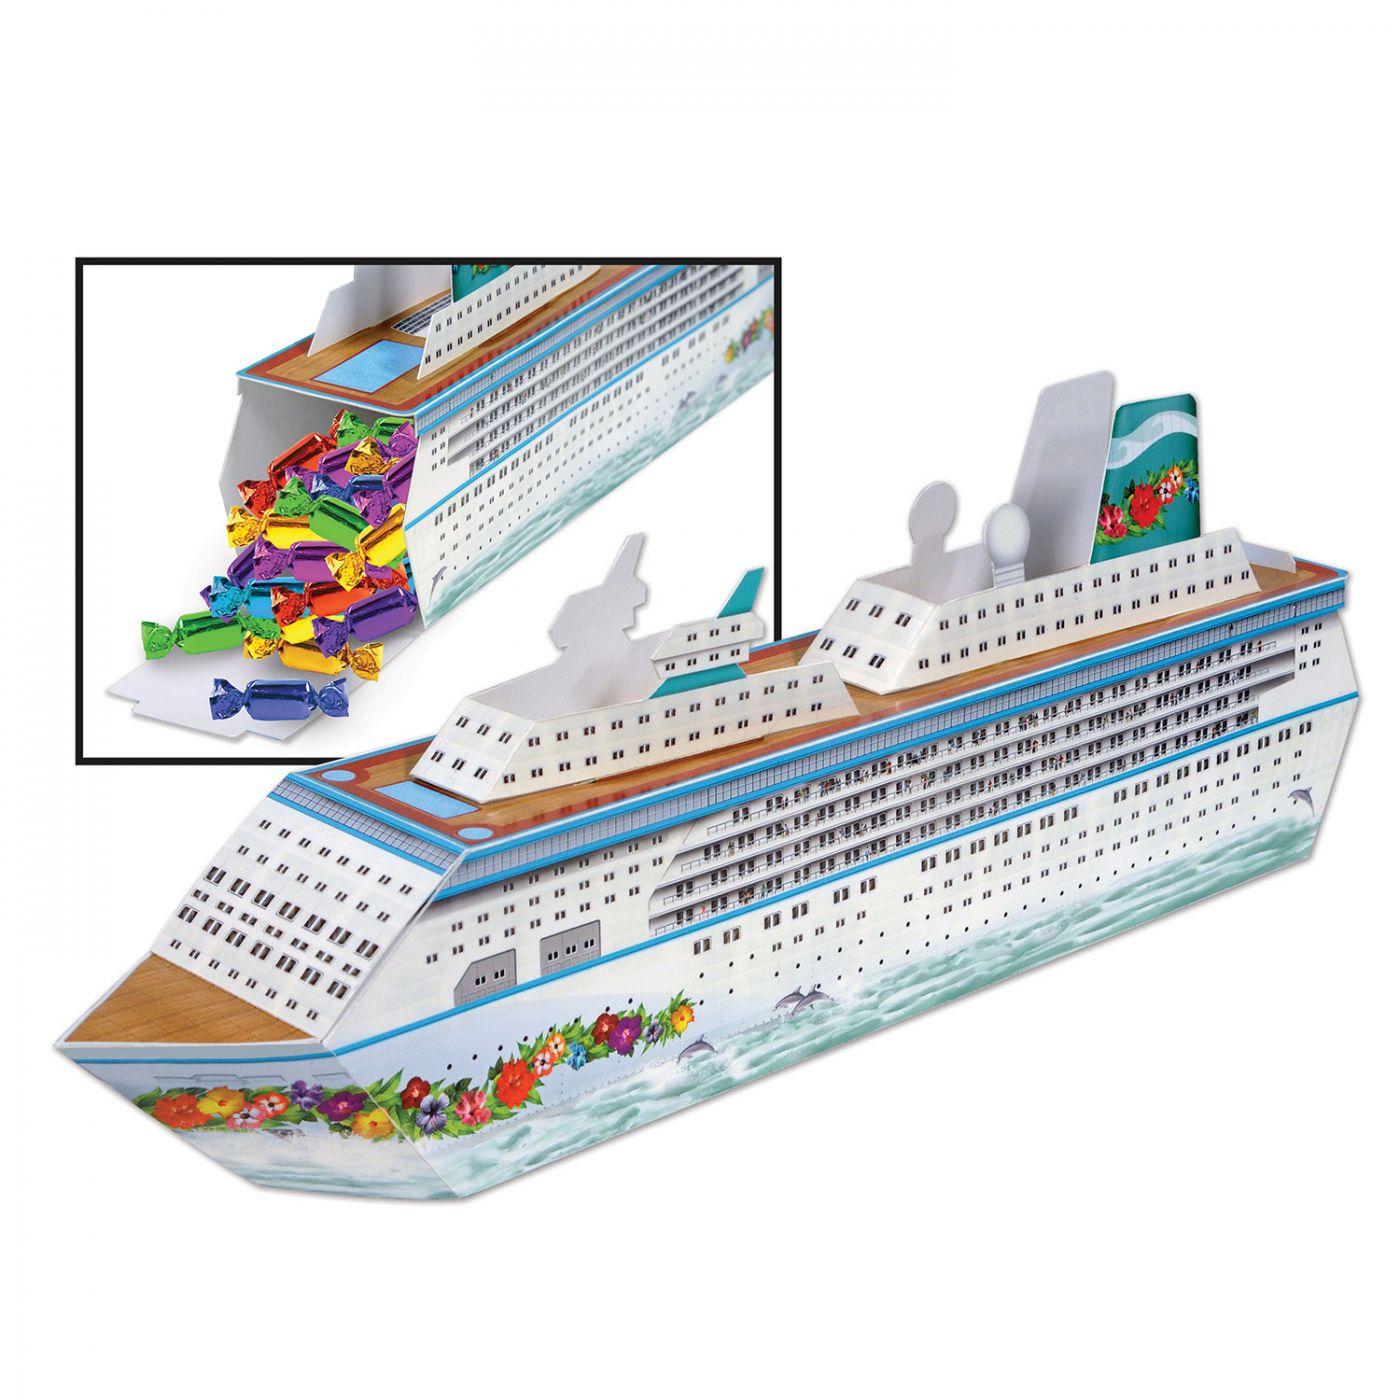 Cruise Ship Centerpiece image